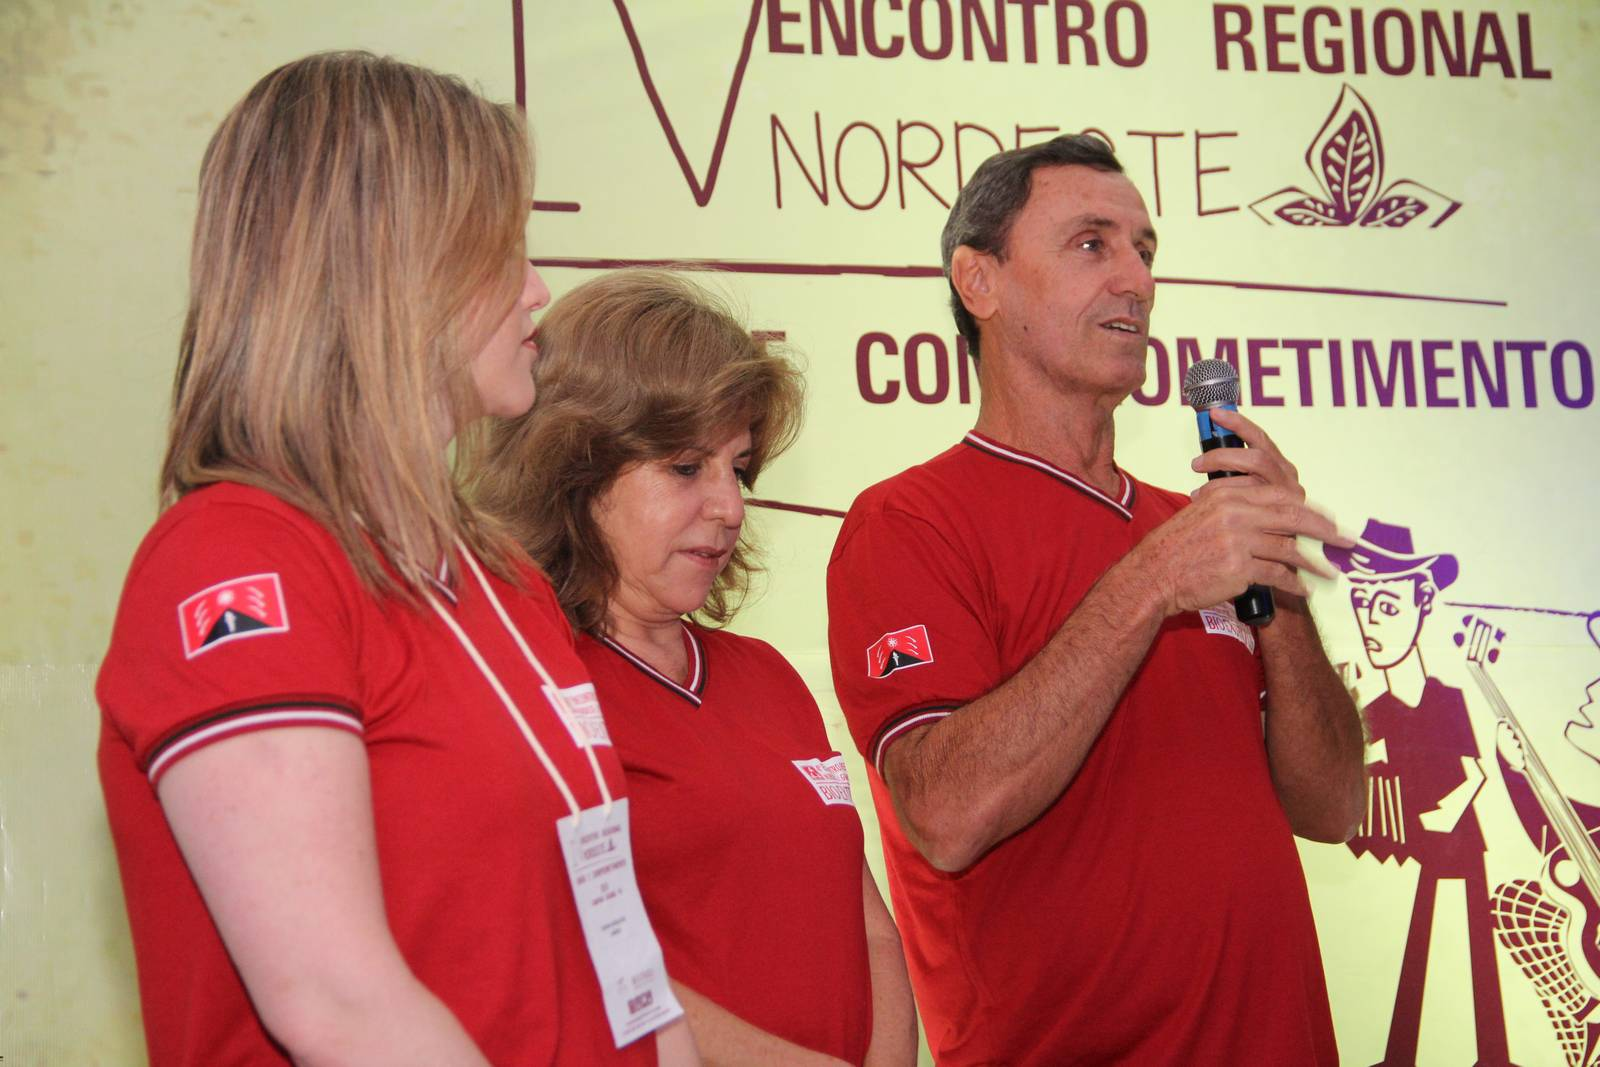 IV Encontro Regional do Nordeste - Bio Extratus (65)